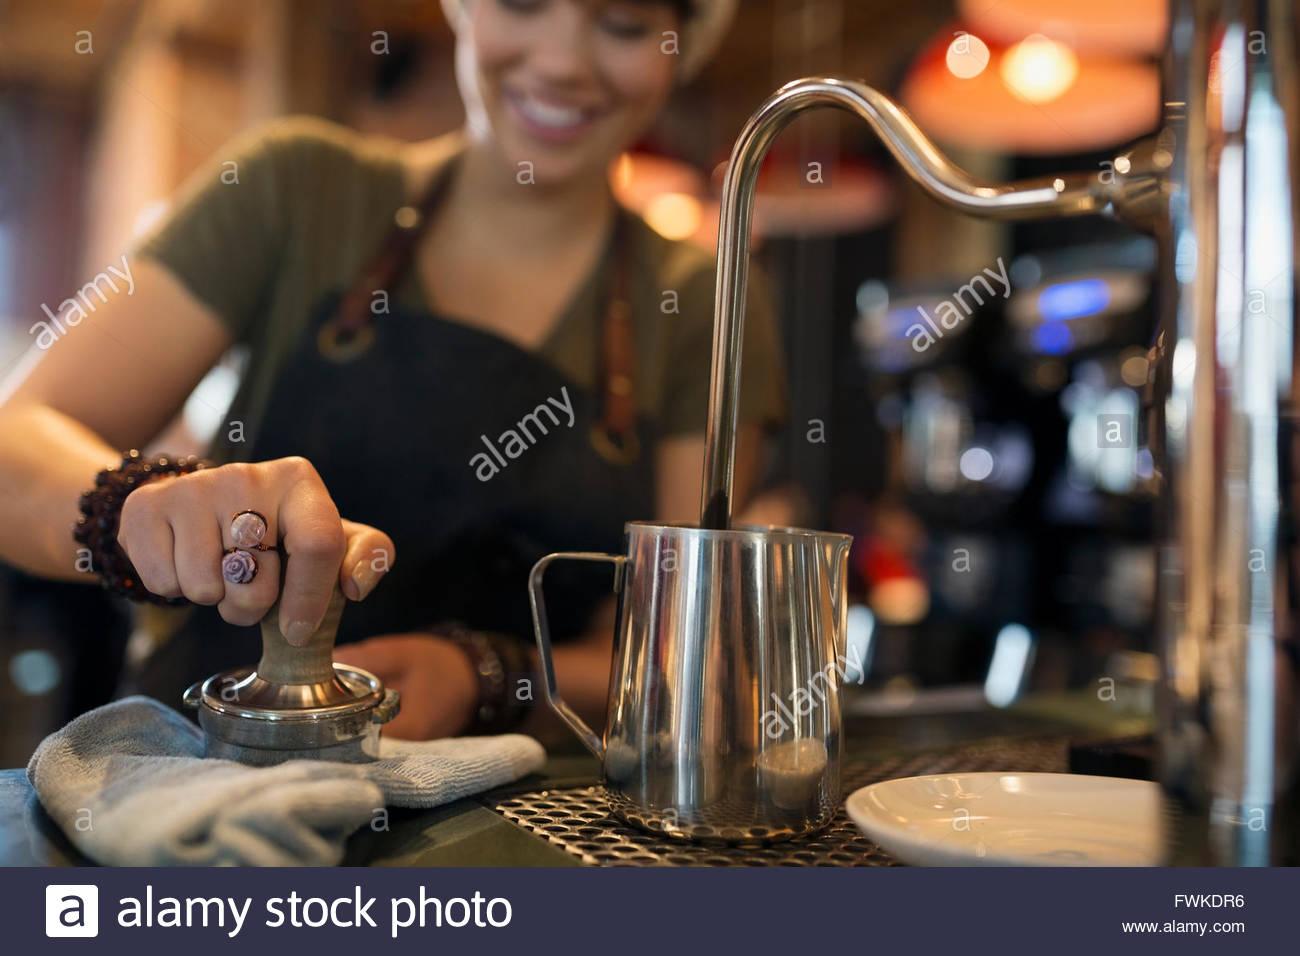 Barista pressing espresso with tamper in coffee shop - Stock Image